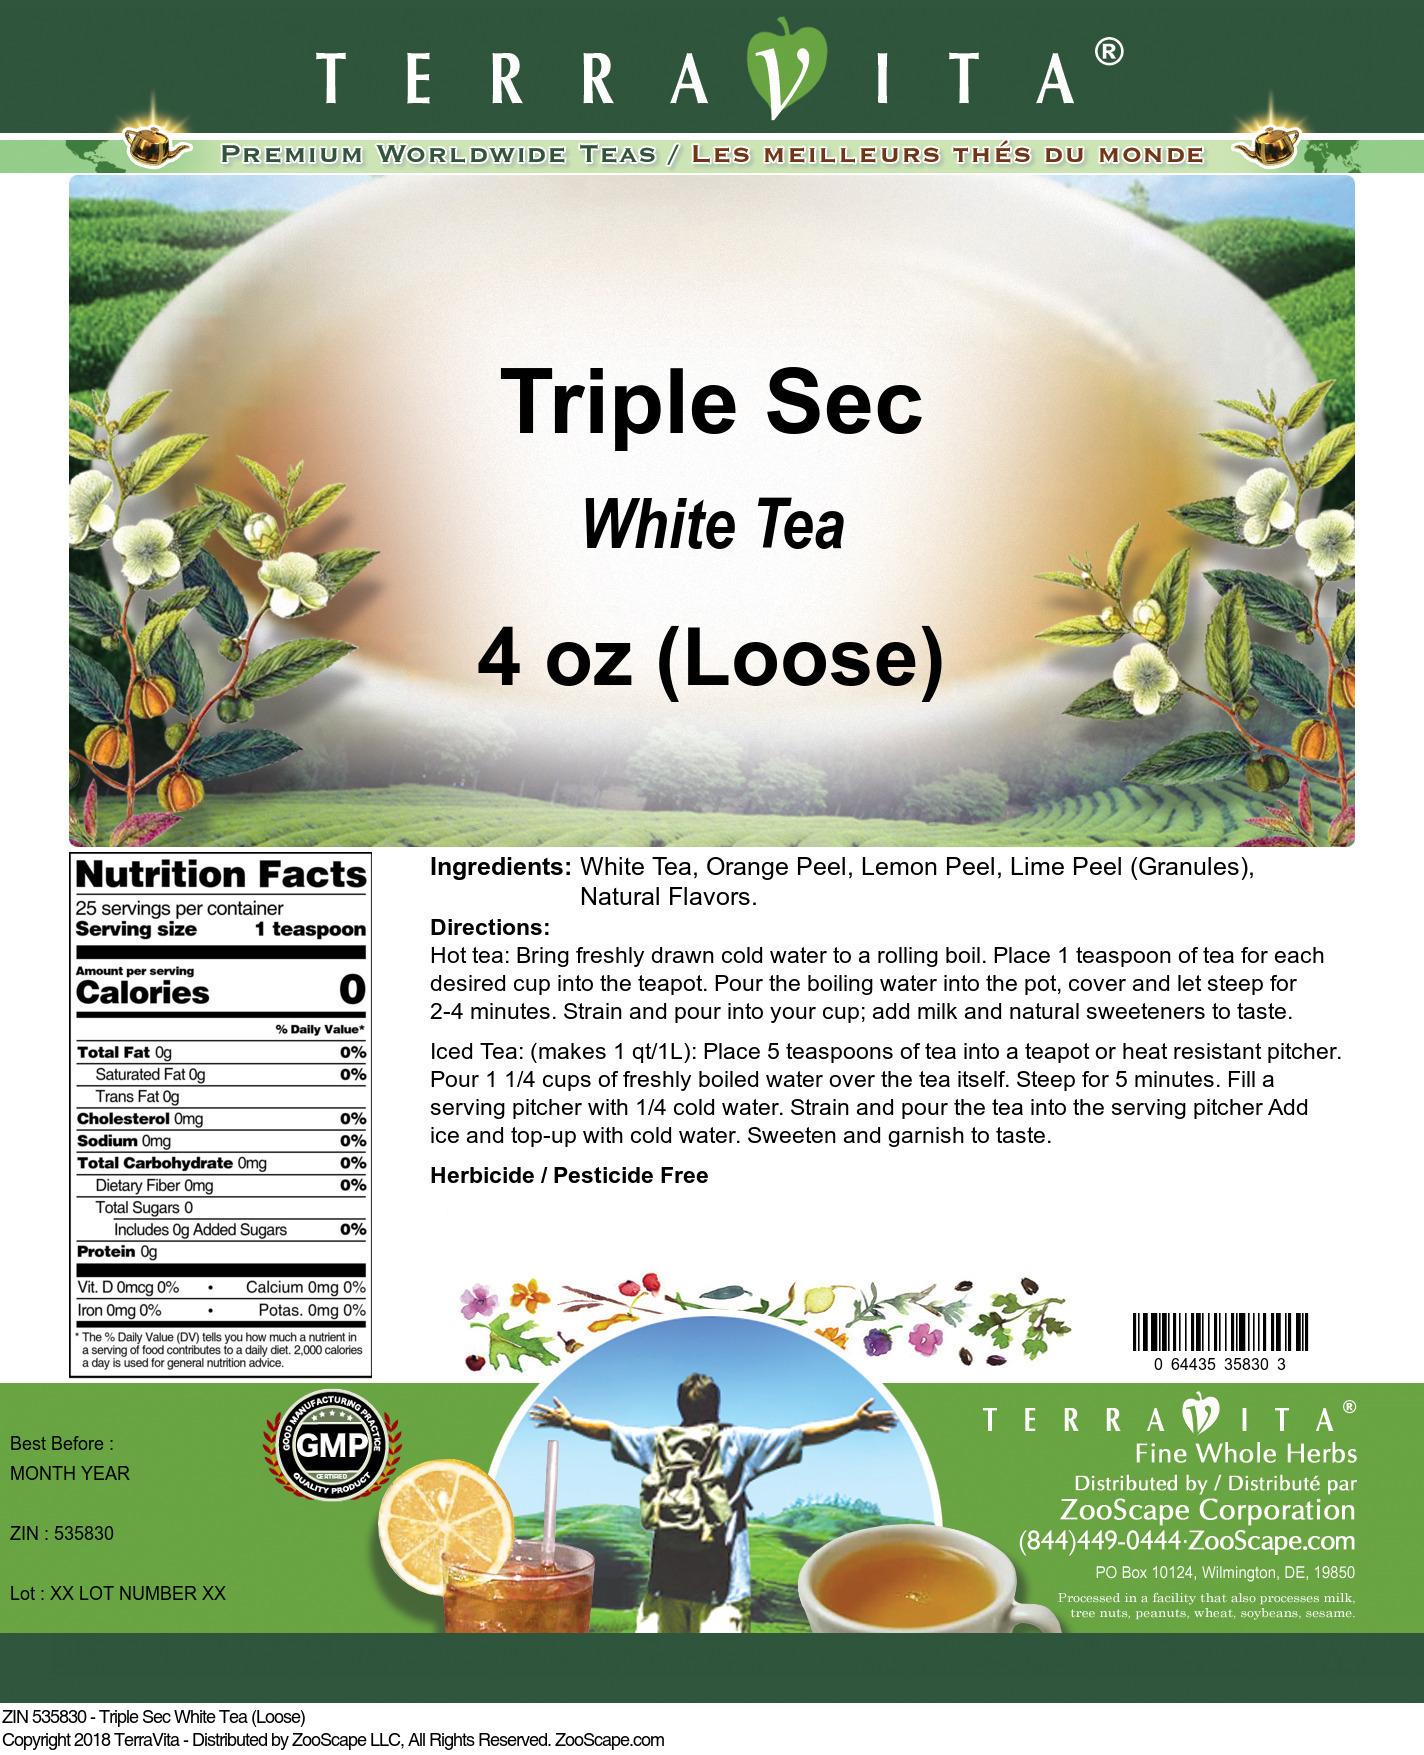 Triple Sec White Tea